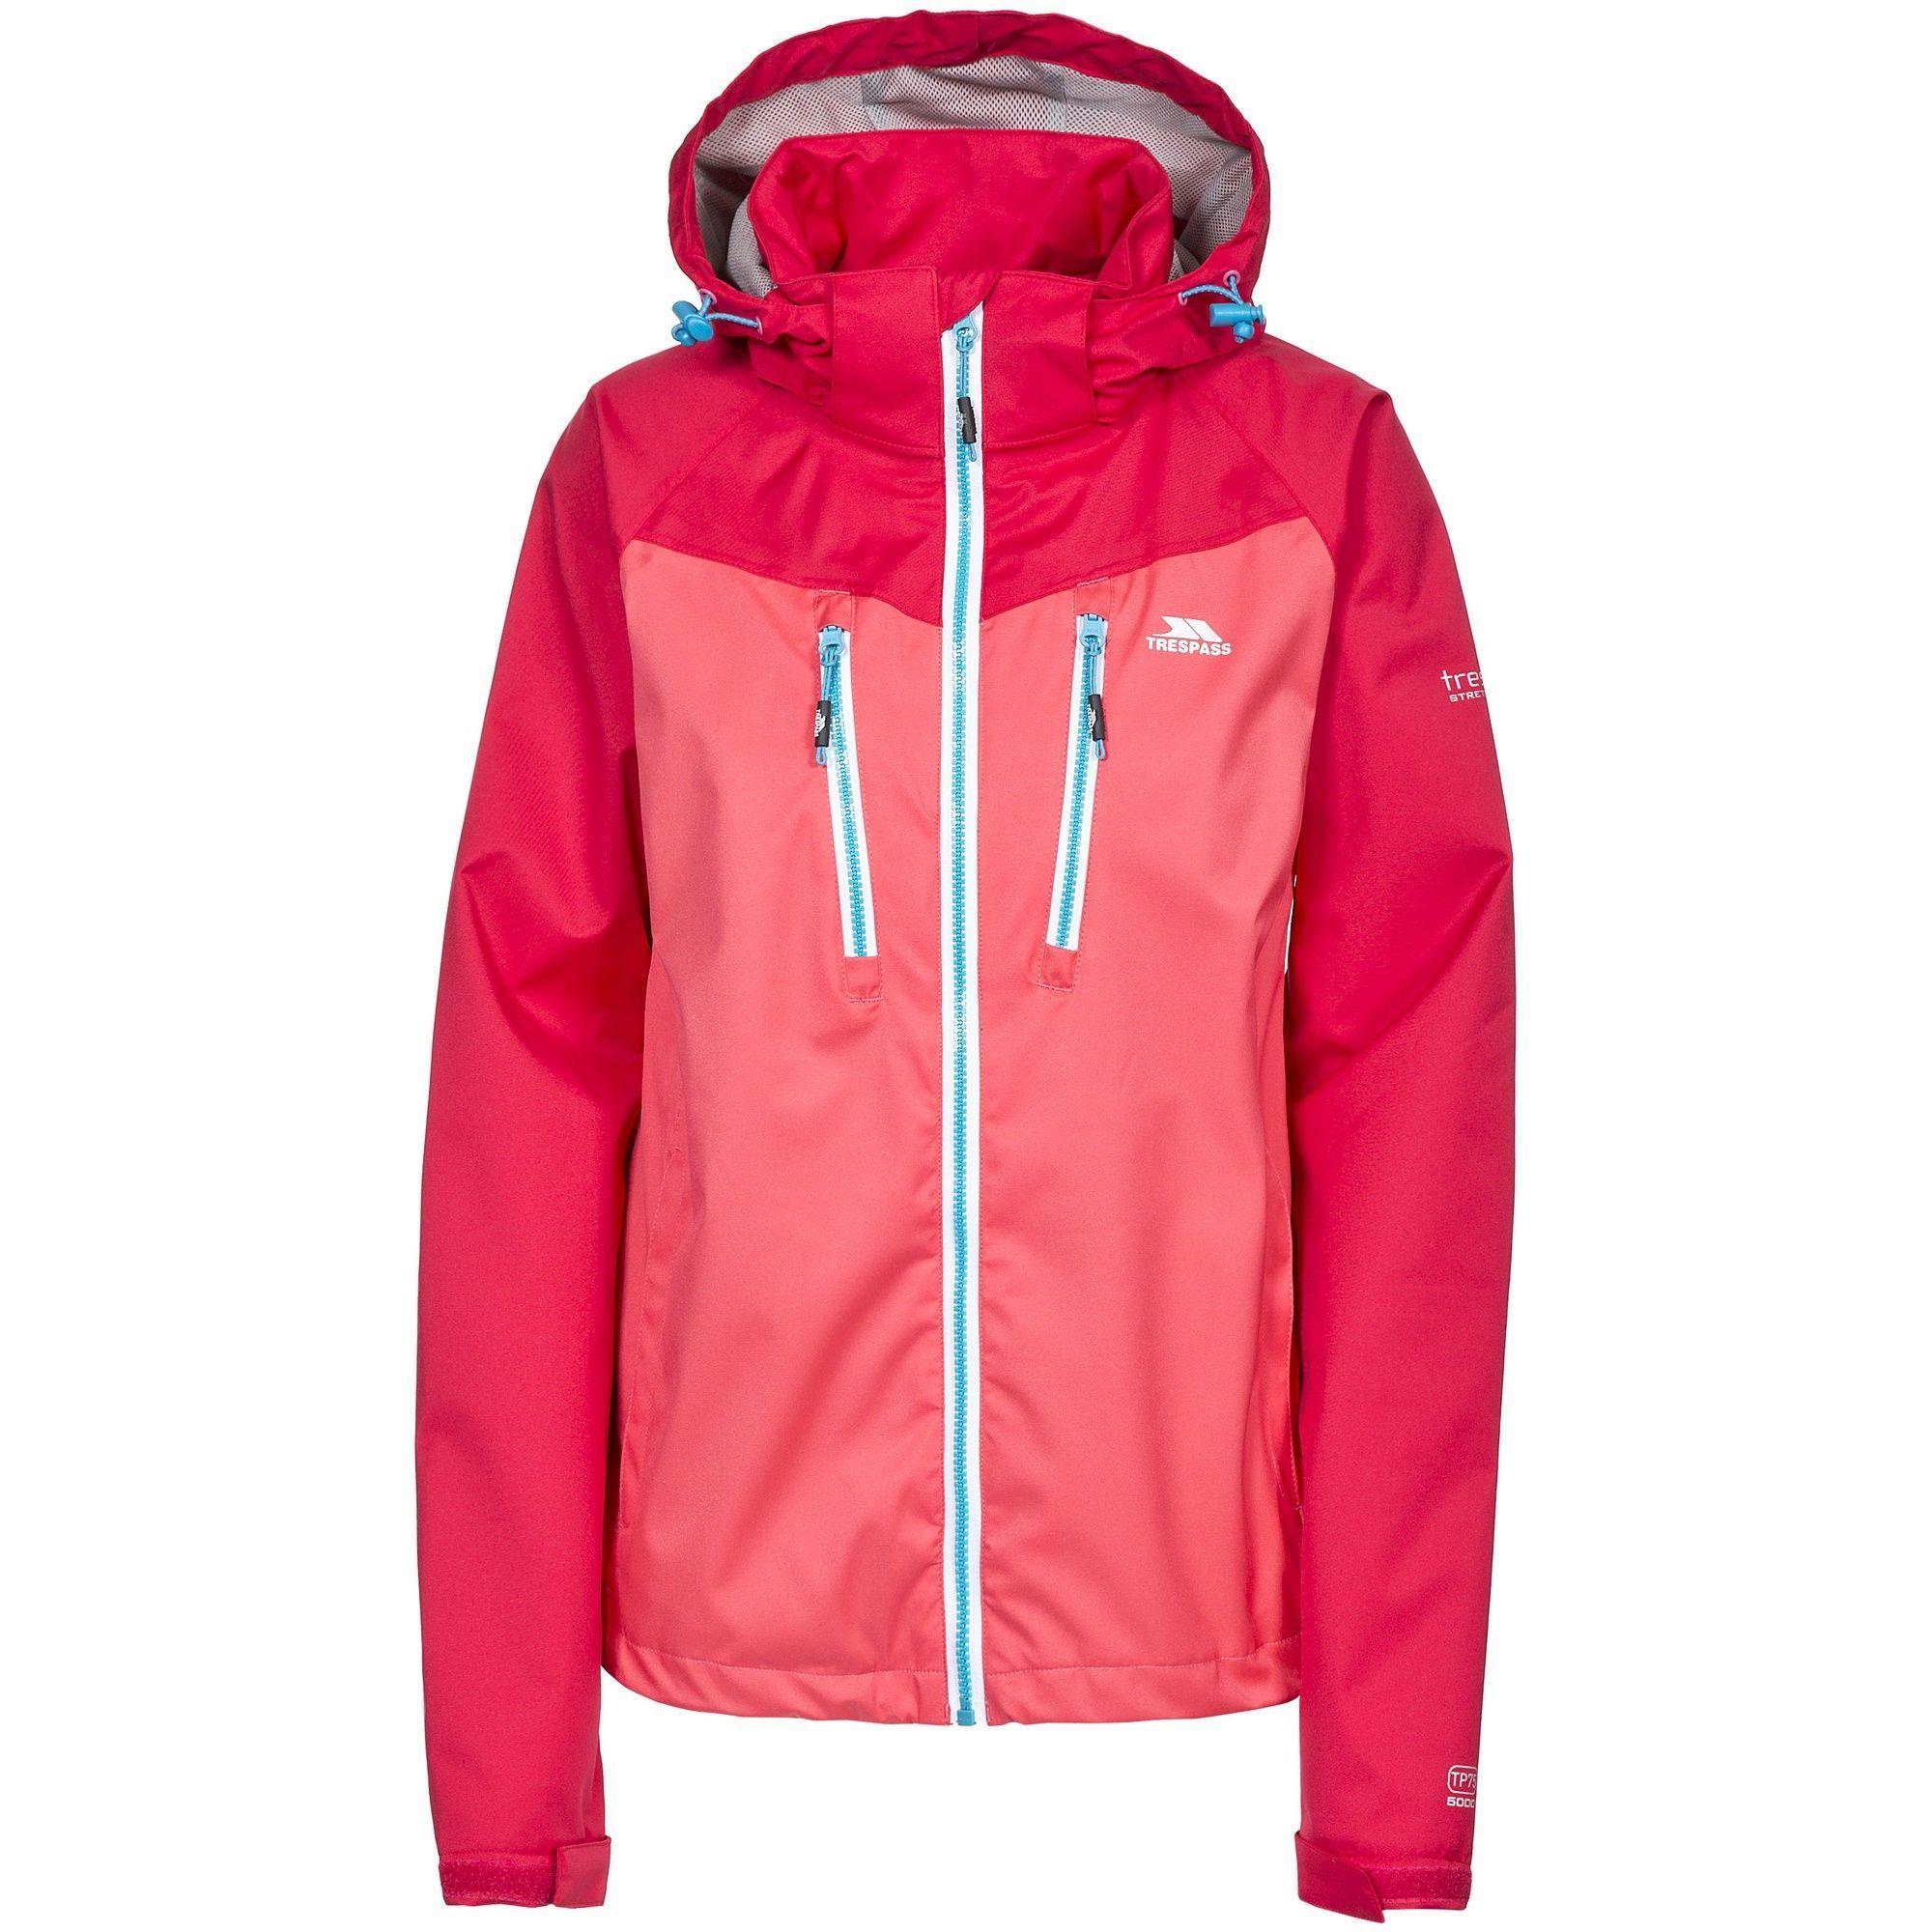 Trespass Womens/Ladies Farrah Waterproof Jacket